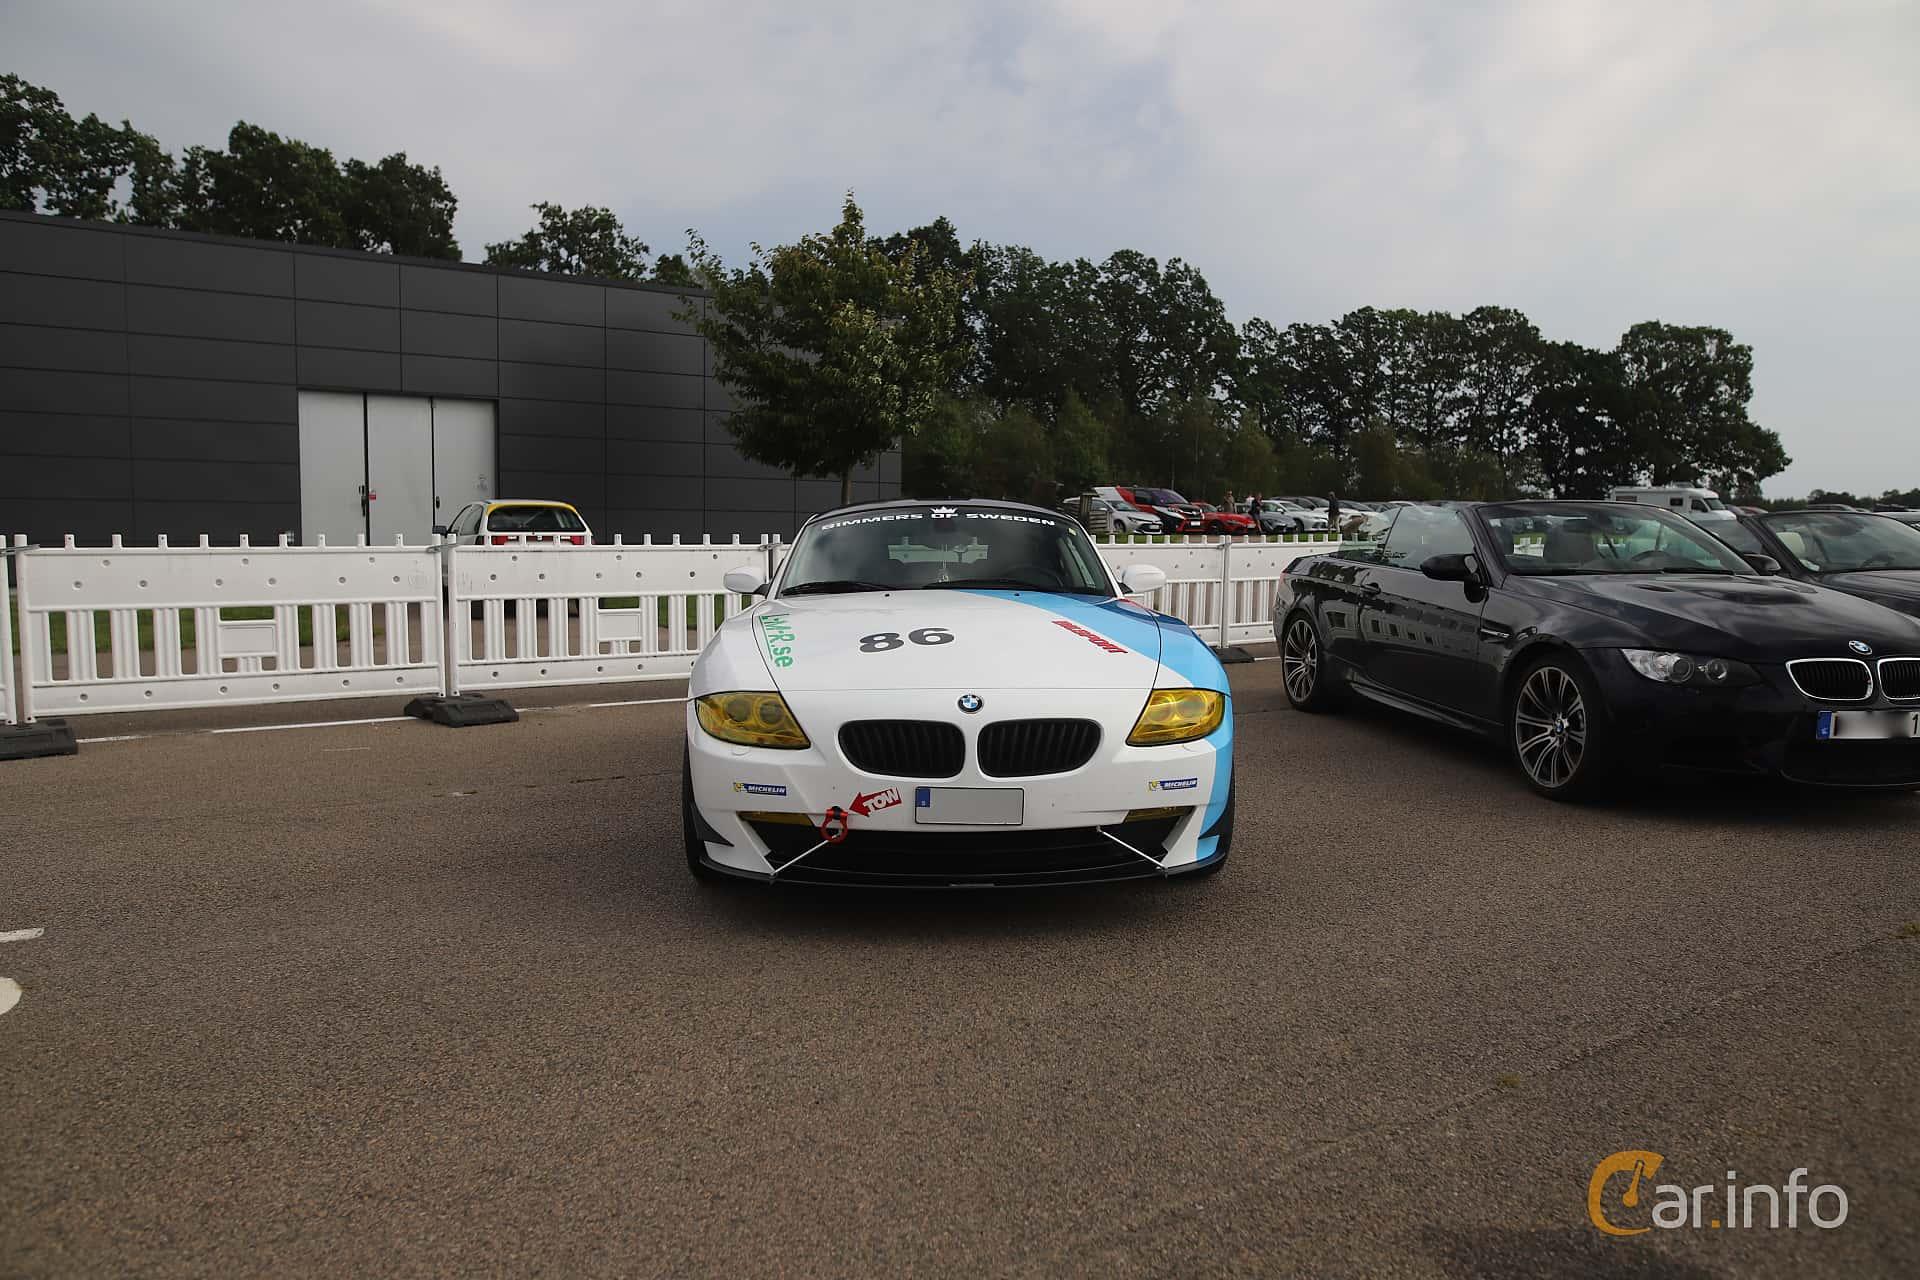 BMW Z4 3.0si Coupé  Manual, 265hp, 2007 at Autoropa Racing day Knutstorp 2019